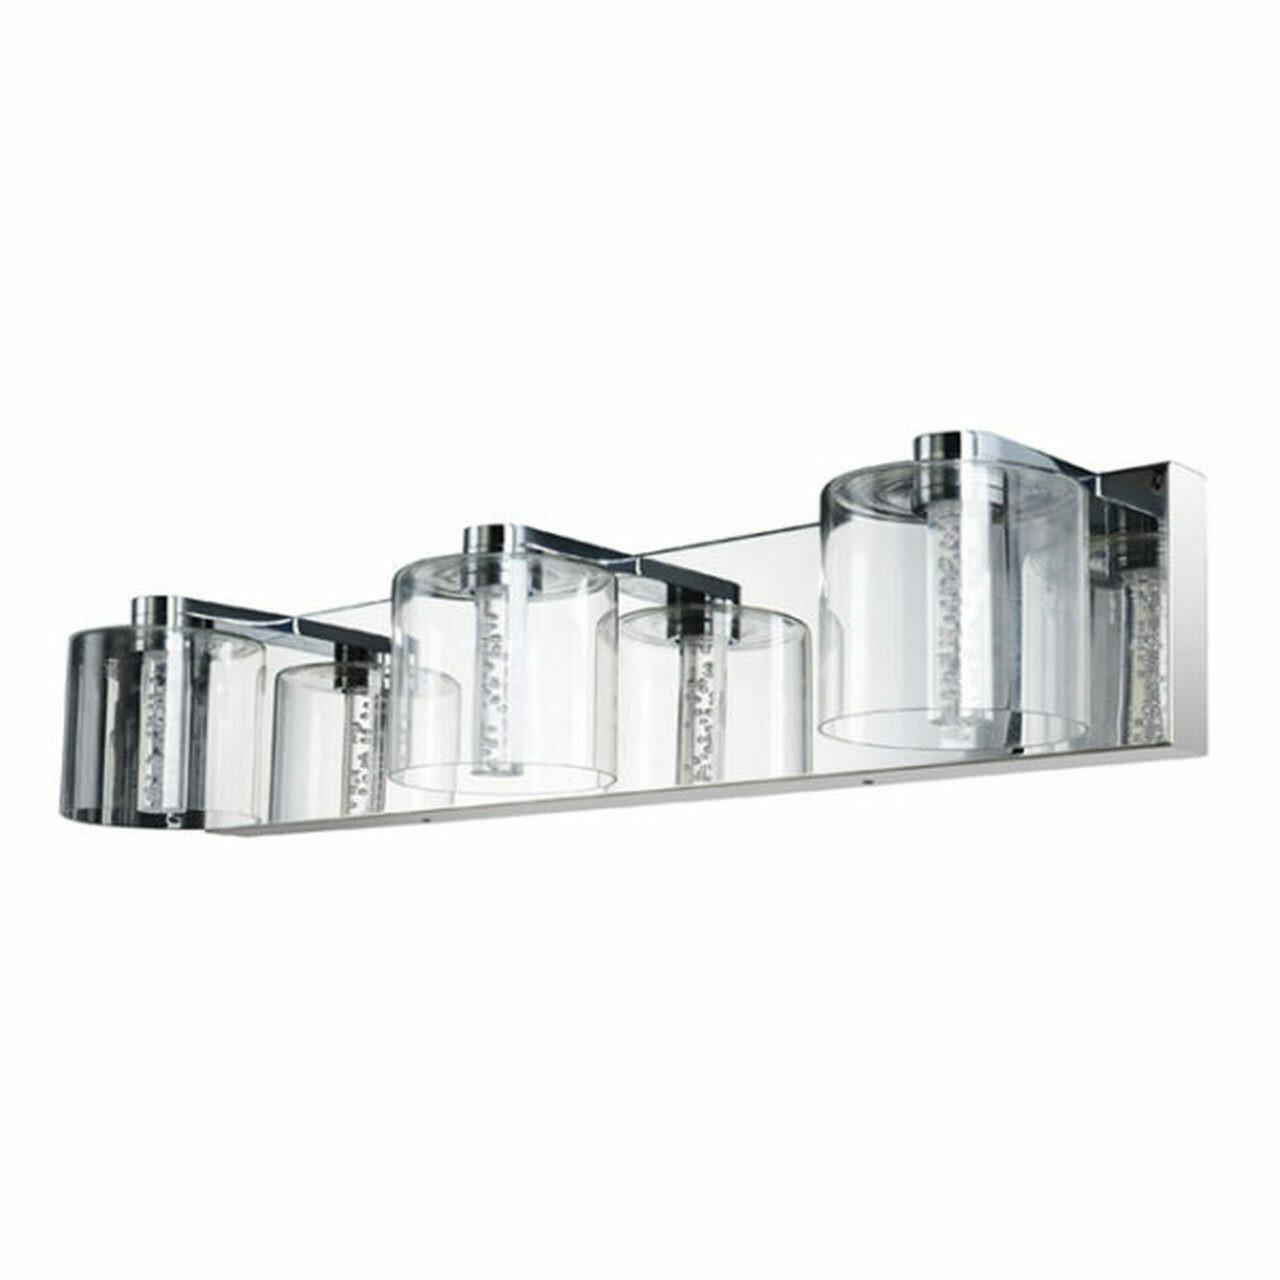 3 Light for Bath Vanity - LED - Energy Savings up to 80%